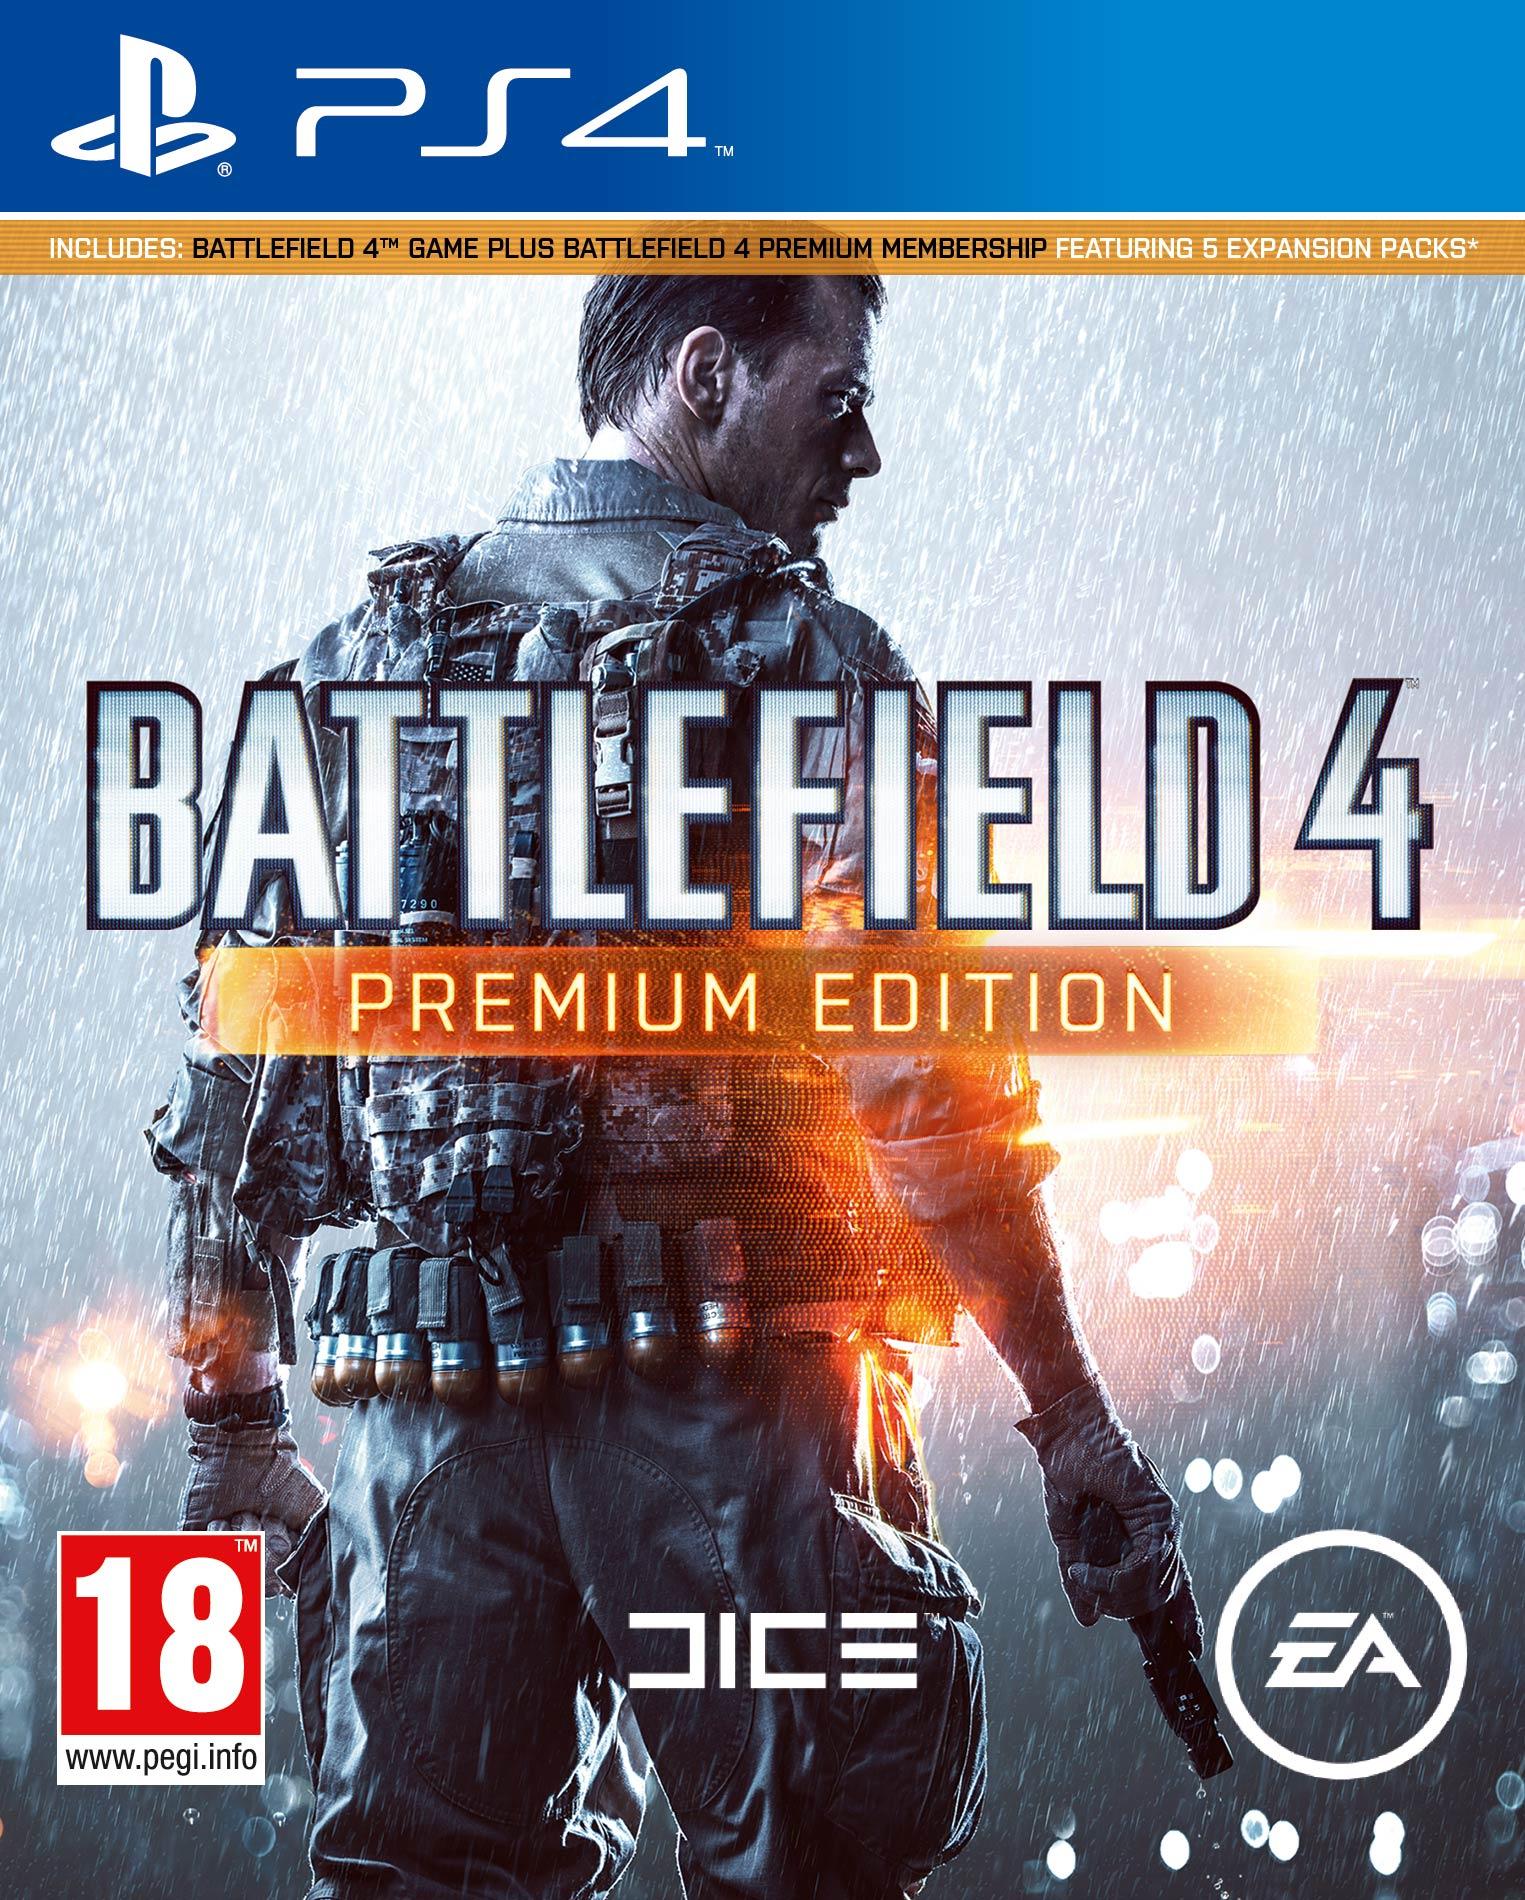 Kaufe Battlefield 4 - Premium Edition - PlayStation 4 - Englisch - Ultimate  Edition